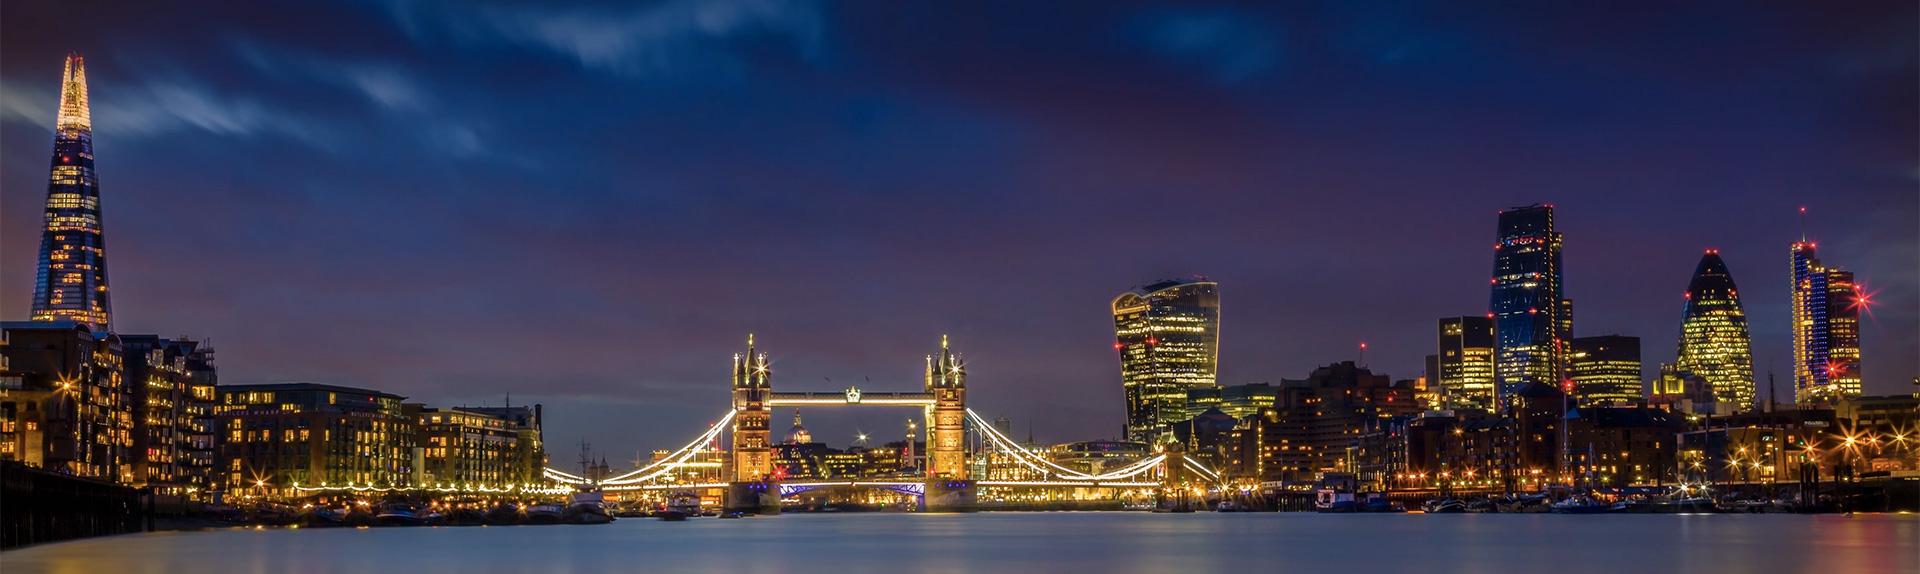 londonslider